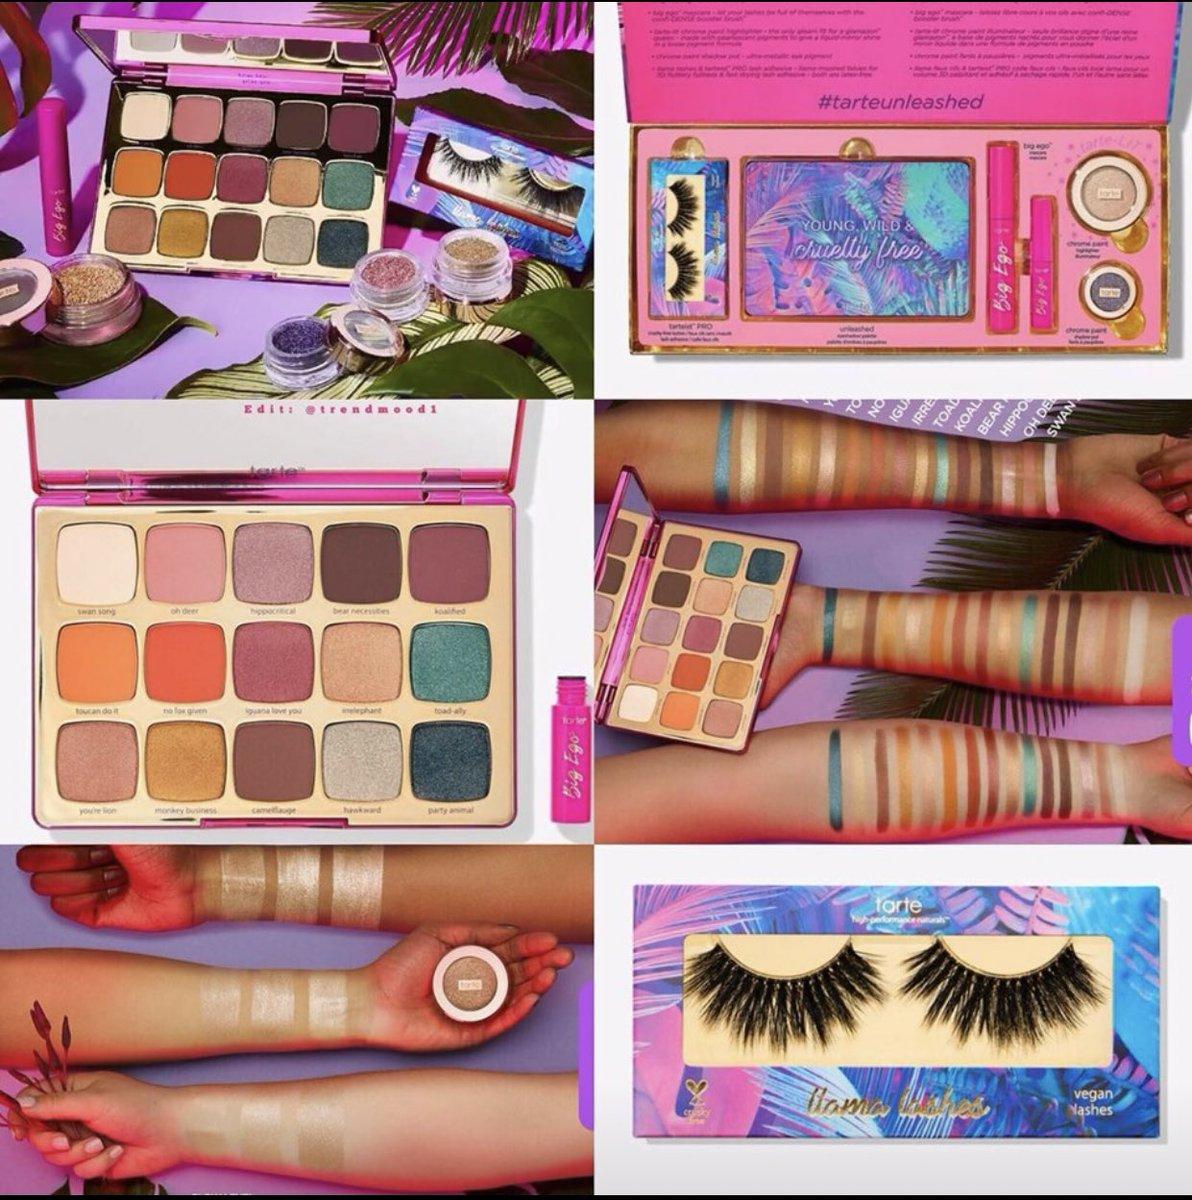 JUST Dropped!  LINK   http:// bit.ly/2F3bNck     Online #tartecosmetics  NEW #Collection includes:  -Unleashed #EyeshadowPalette + travel-size big ego mascara $39 -tarte-LIT chrome paint highlighter $30 -llama lashes $12 -chrome paint shadow pot New Shades $22 -vault $105 <br>http://pic.twitter.com/USmVmRyplI